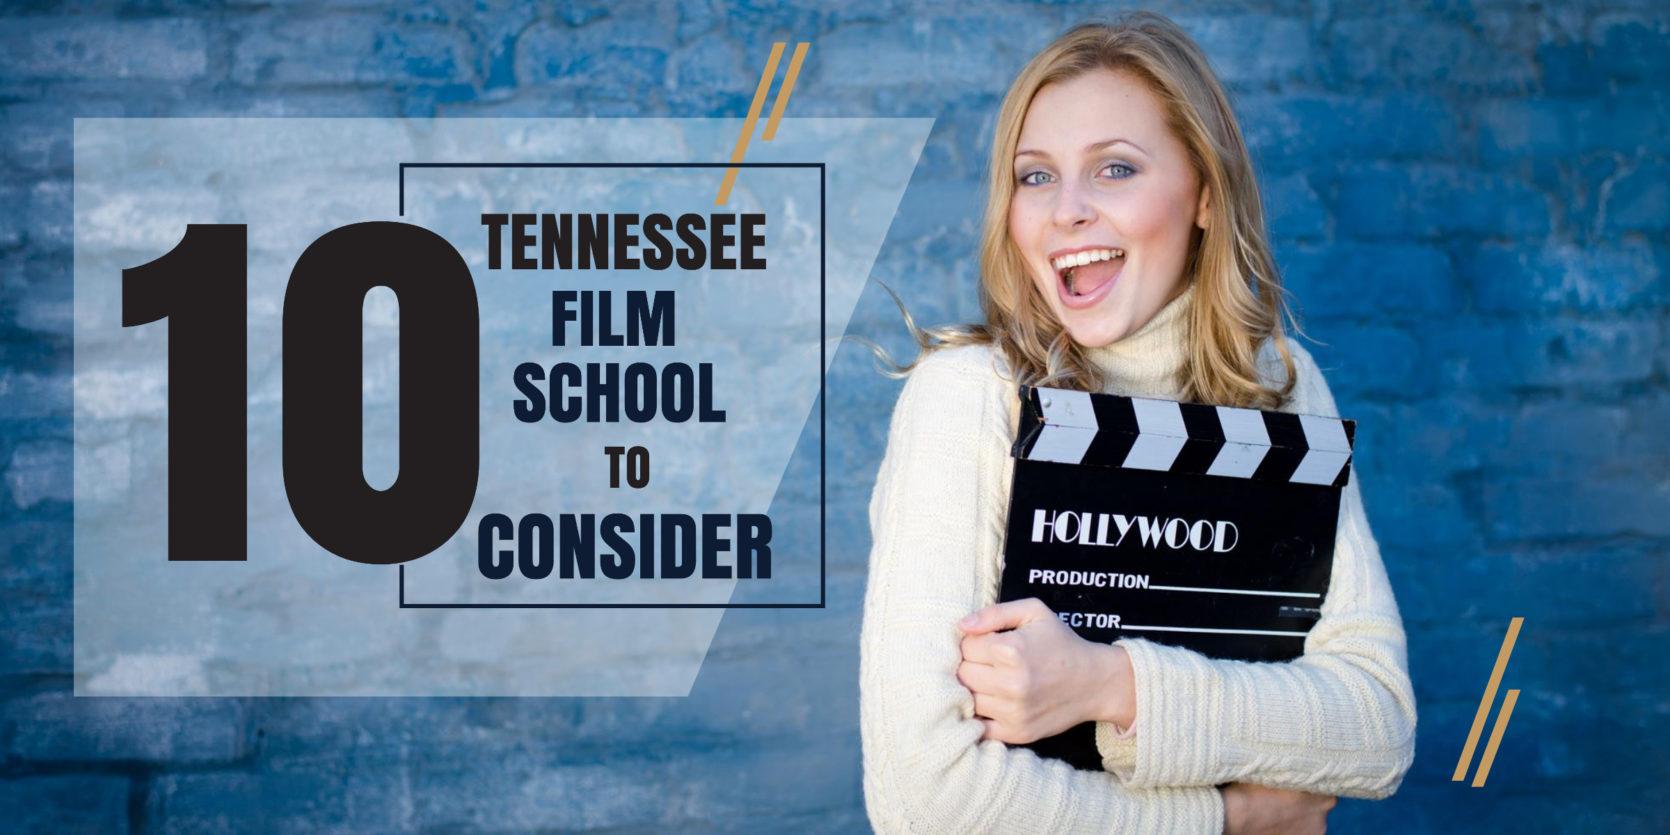 Top 10 Tennessee Film Schools